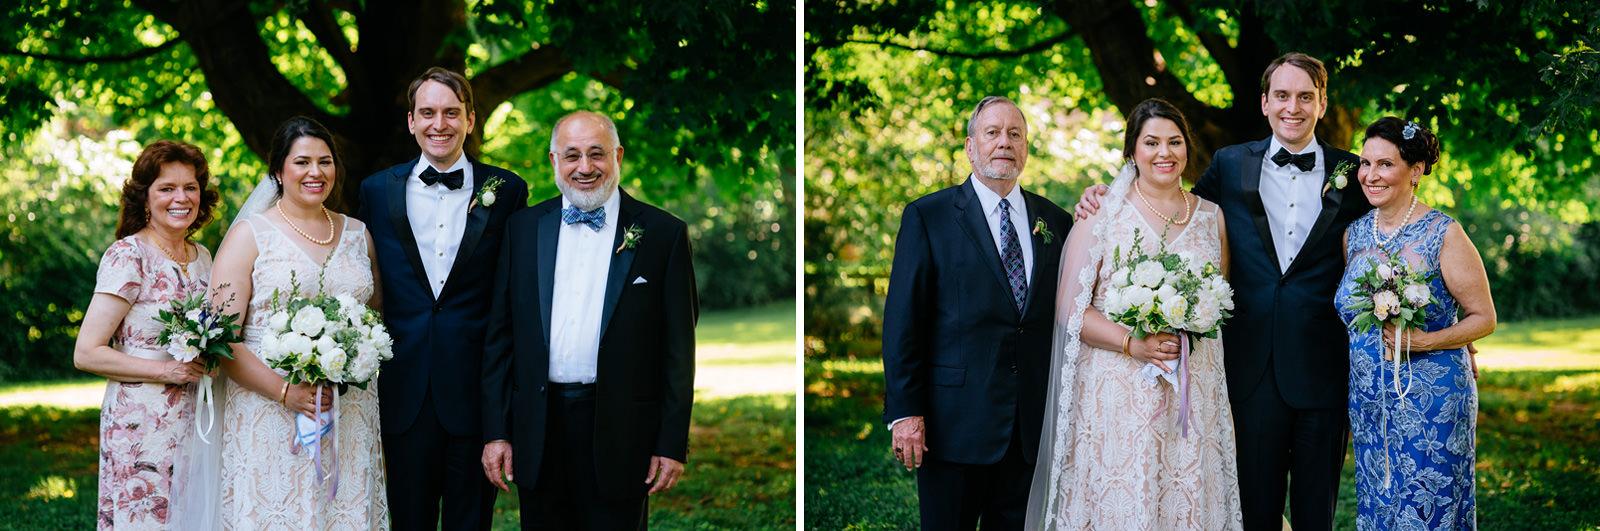 family formals lexington ky wedding